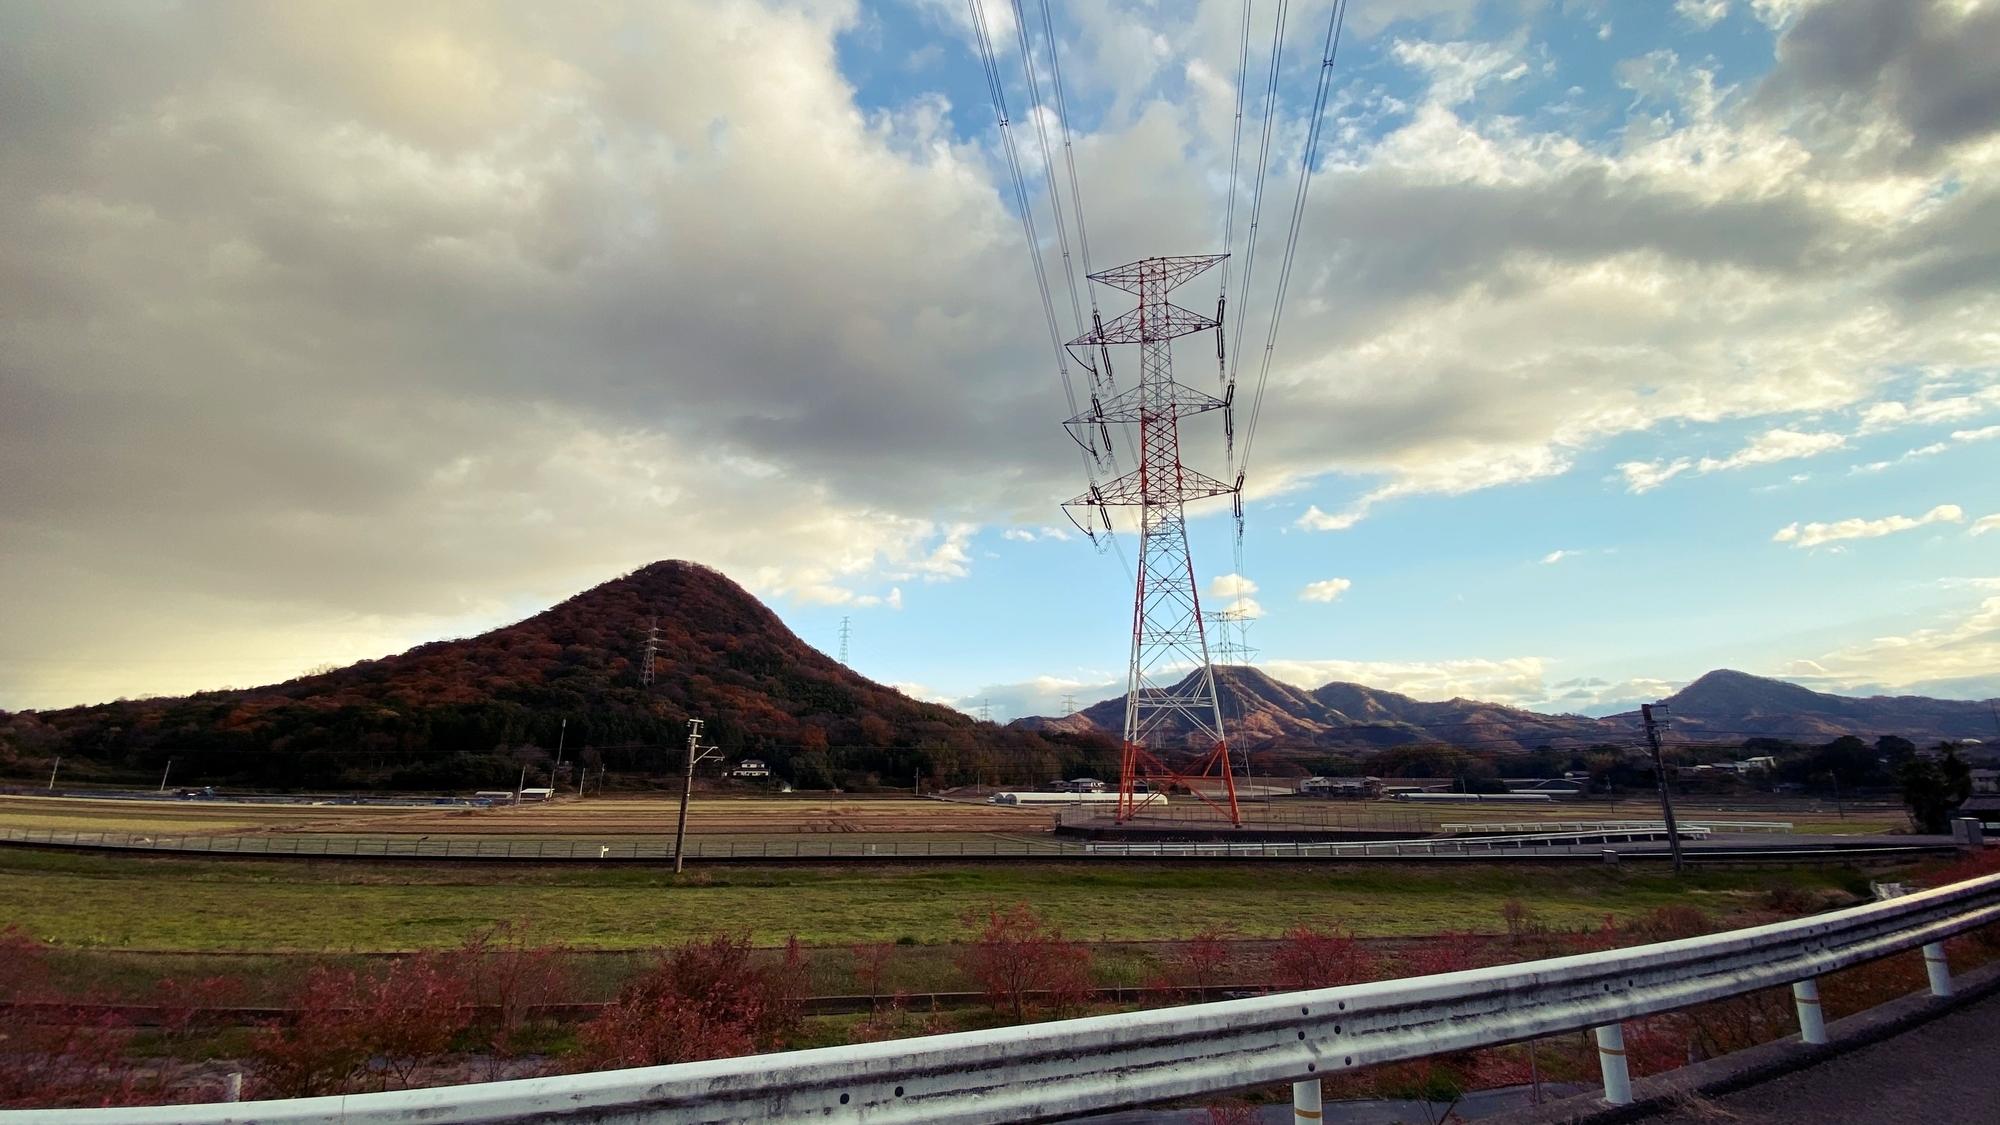 f:id:Logosuke:20201227224752j:plain